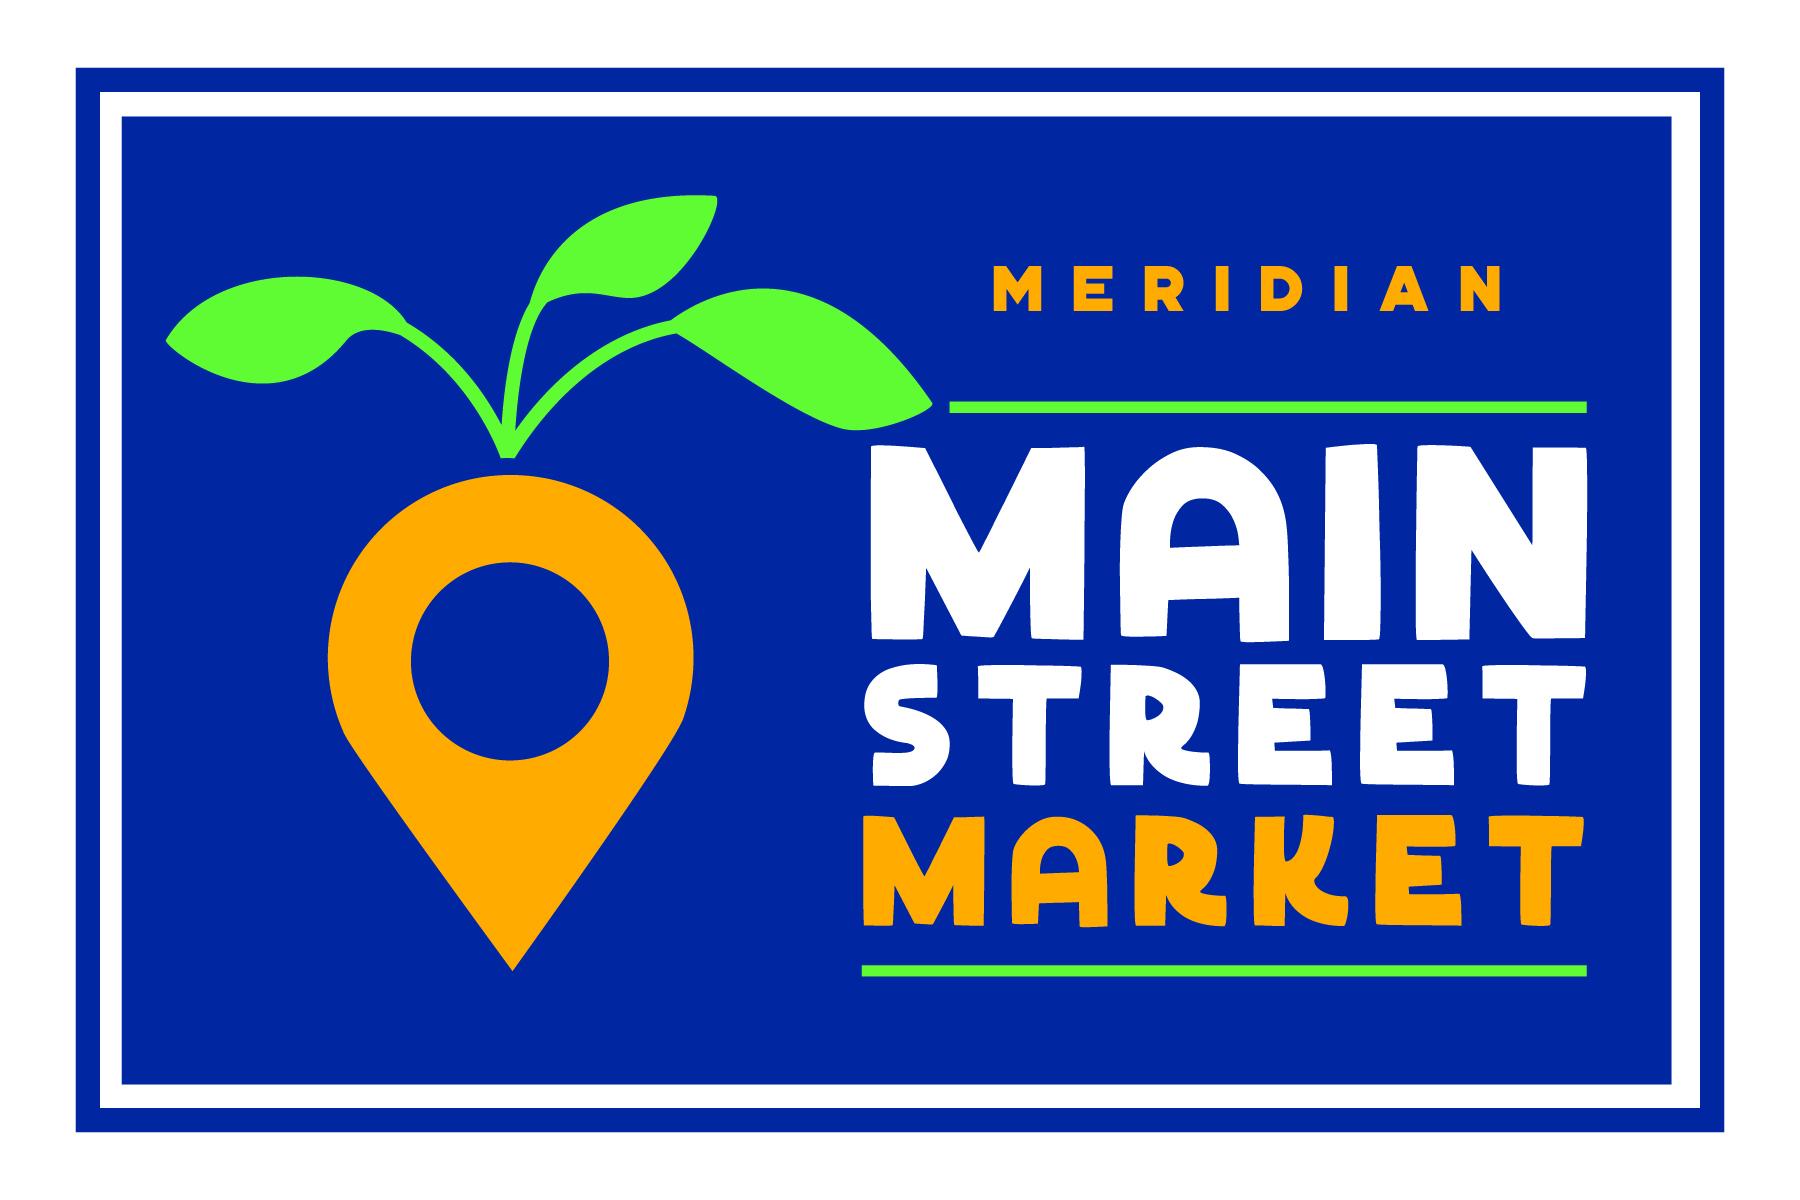 Meridian Main Street Market